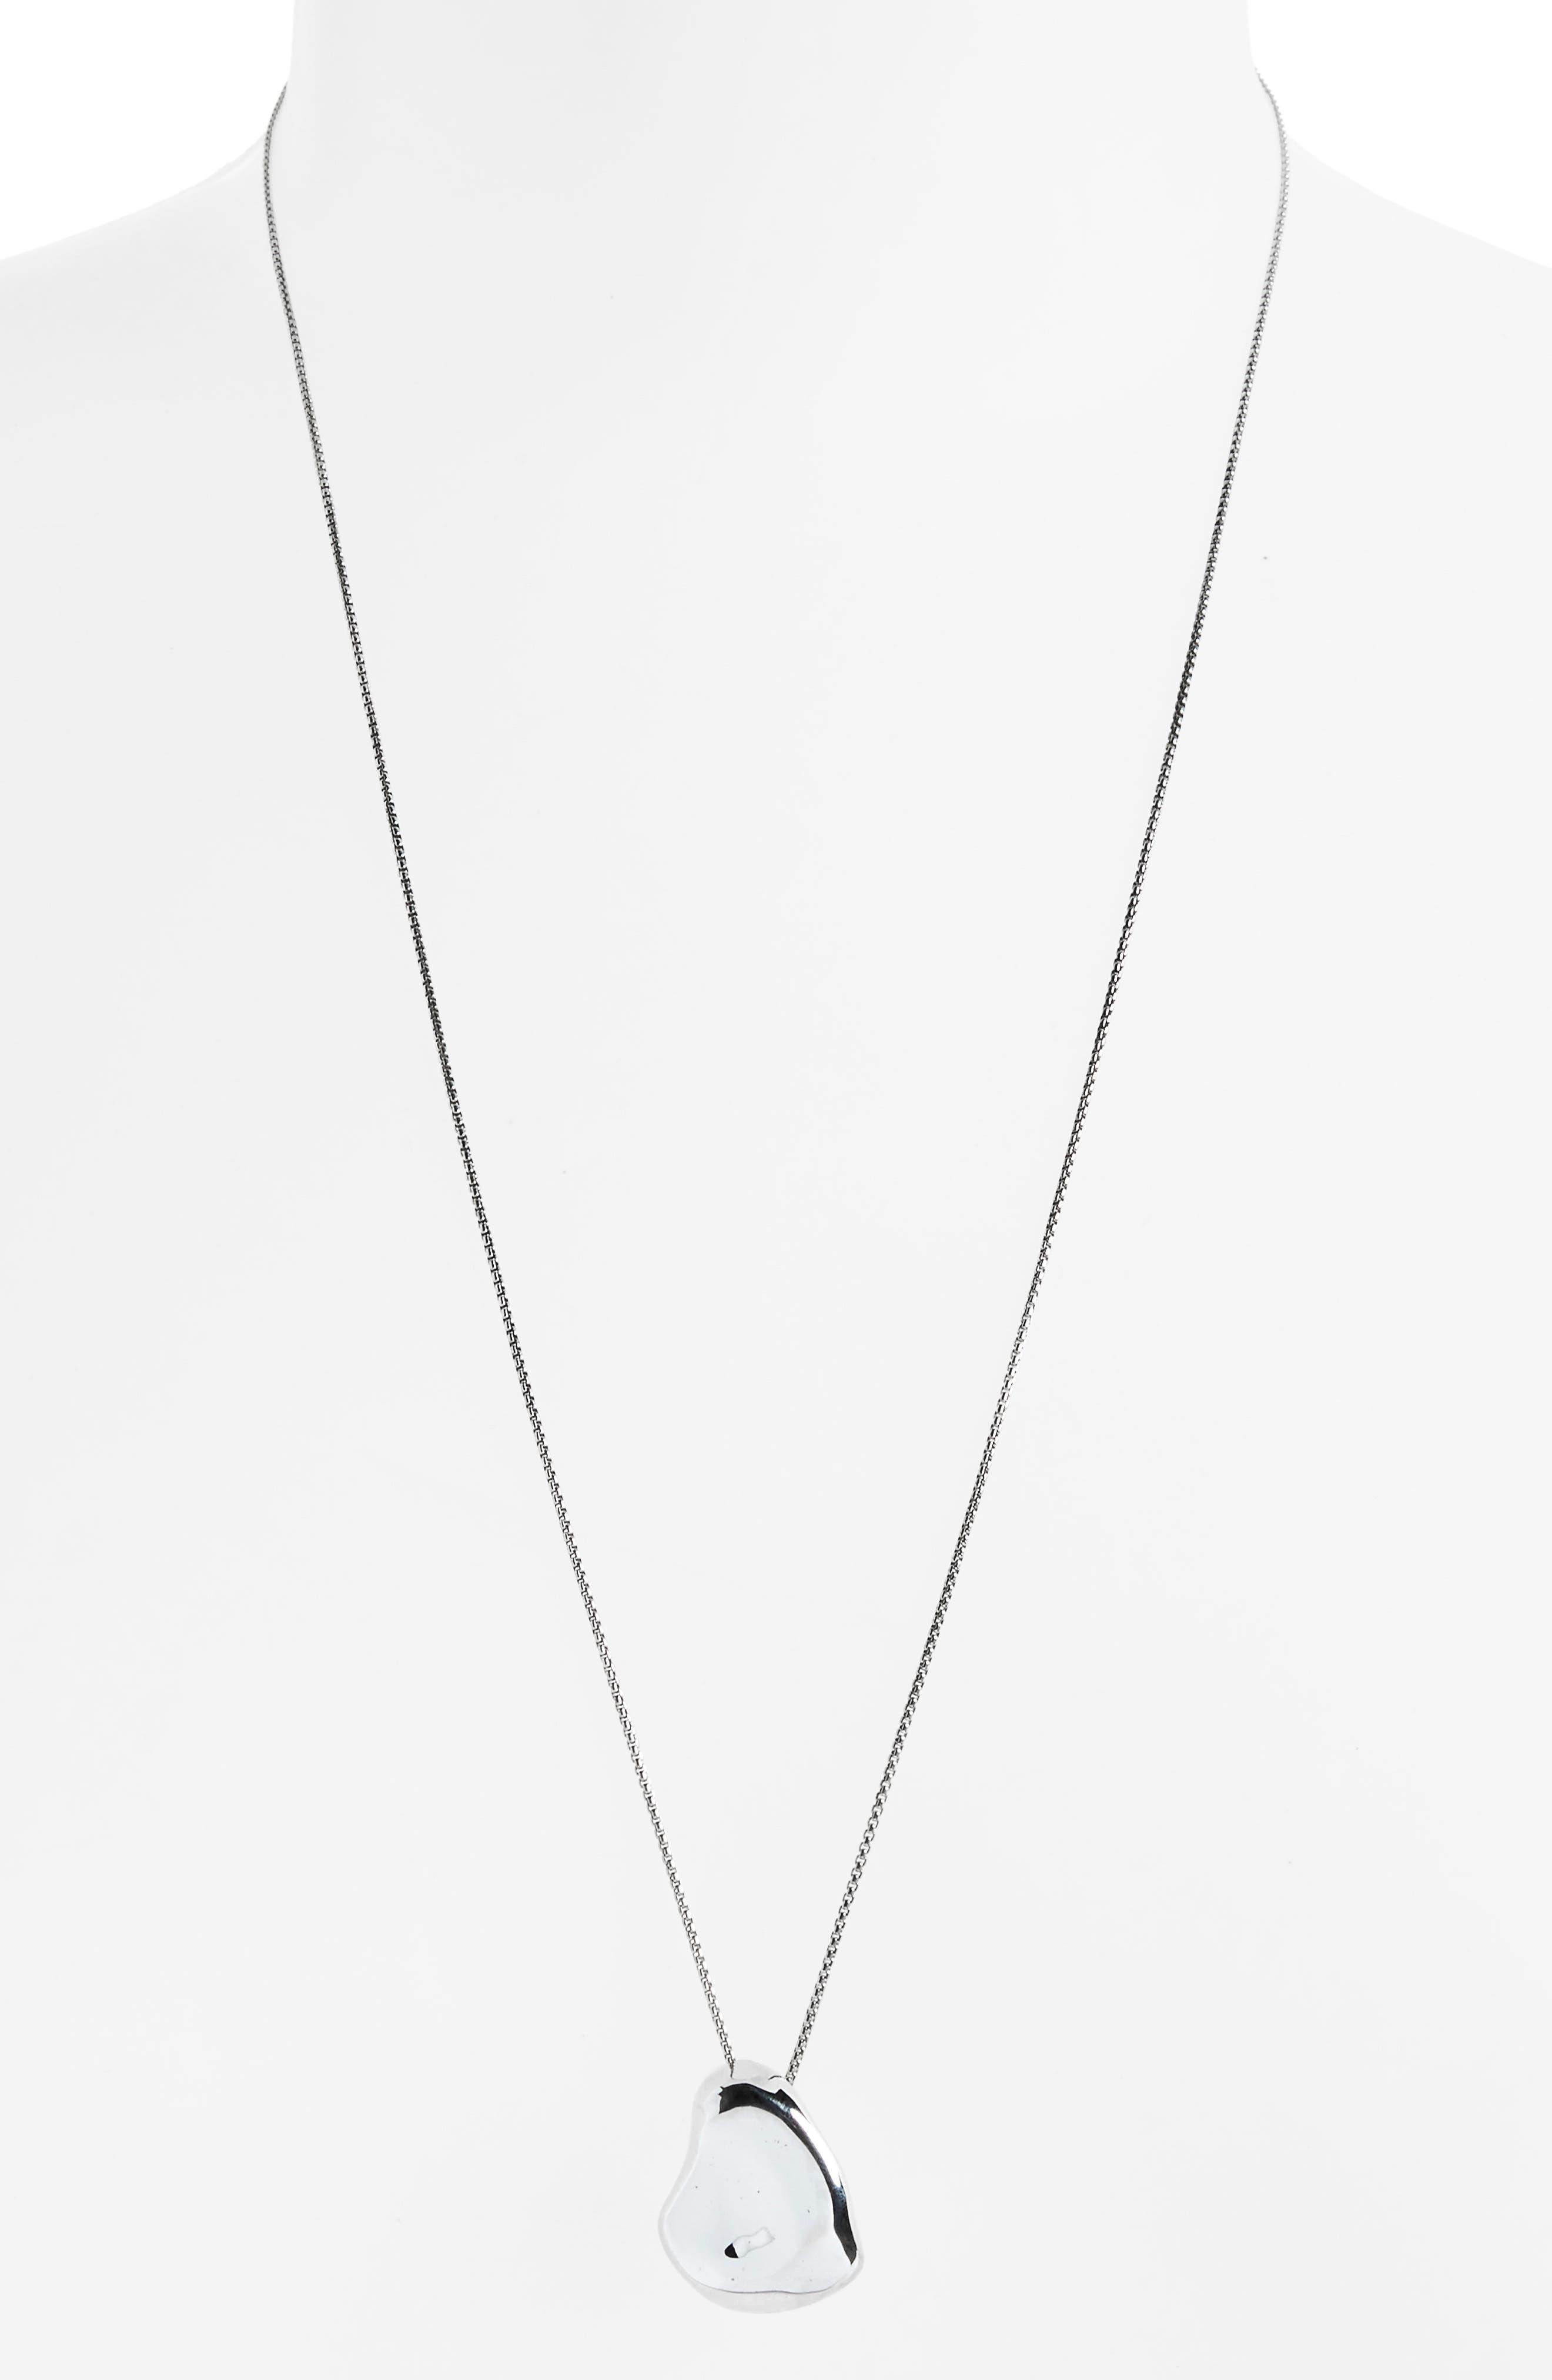 Nug Pendant Necklace,                         Main,                         color, Sterling Silver